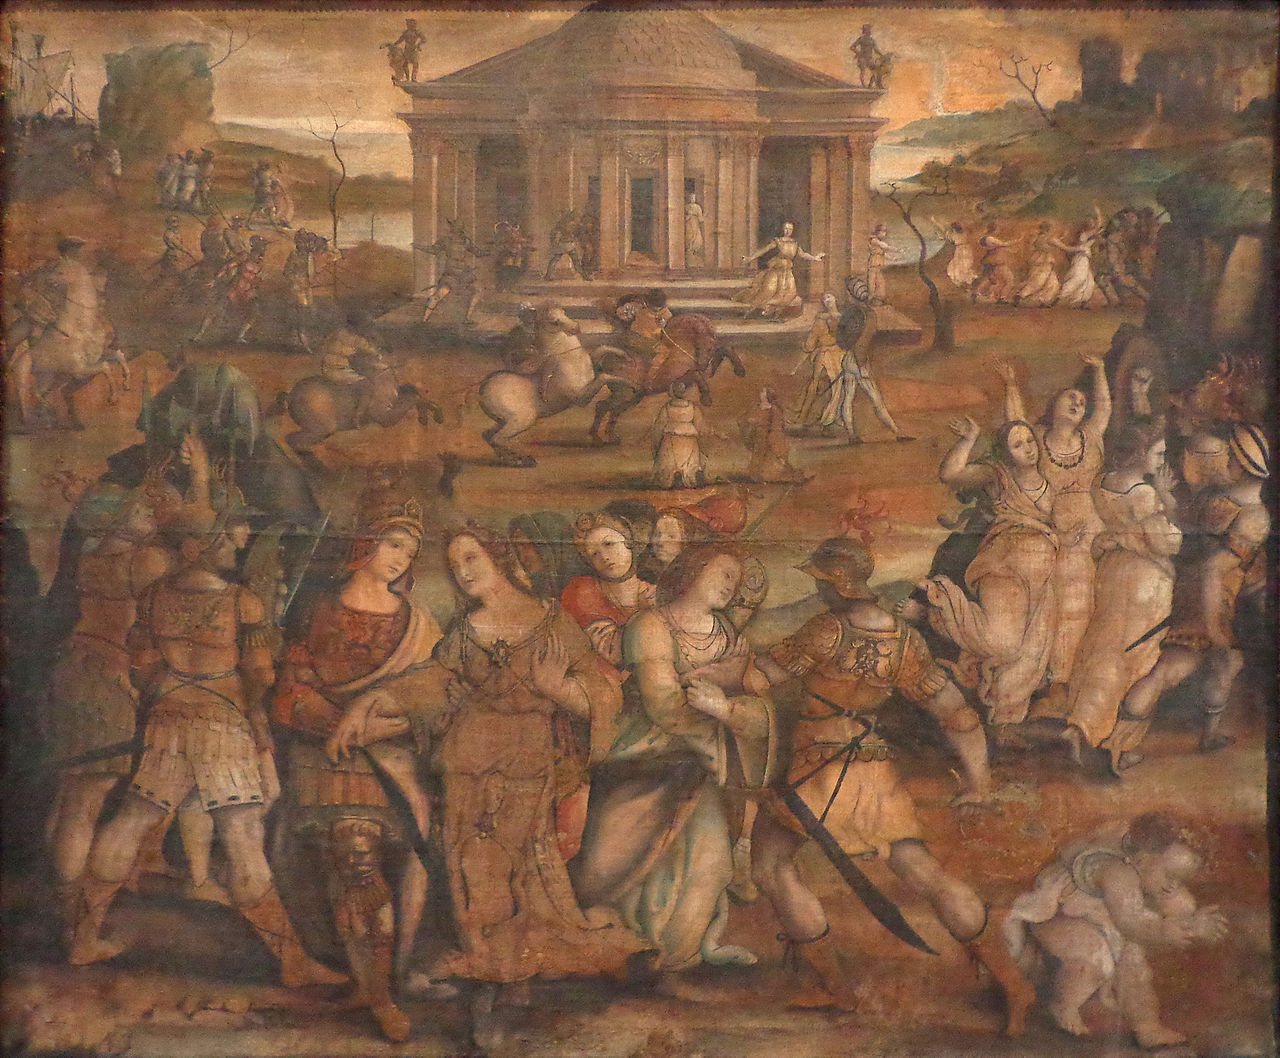 Girolamo_Genga_L'enlèvement_d'Hélène